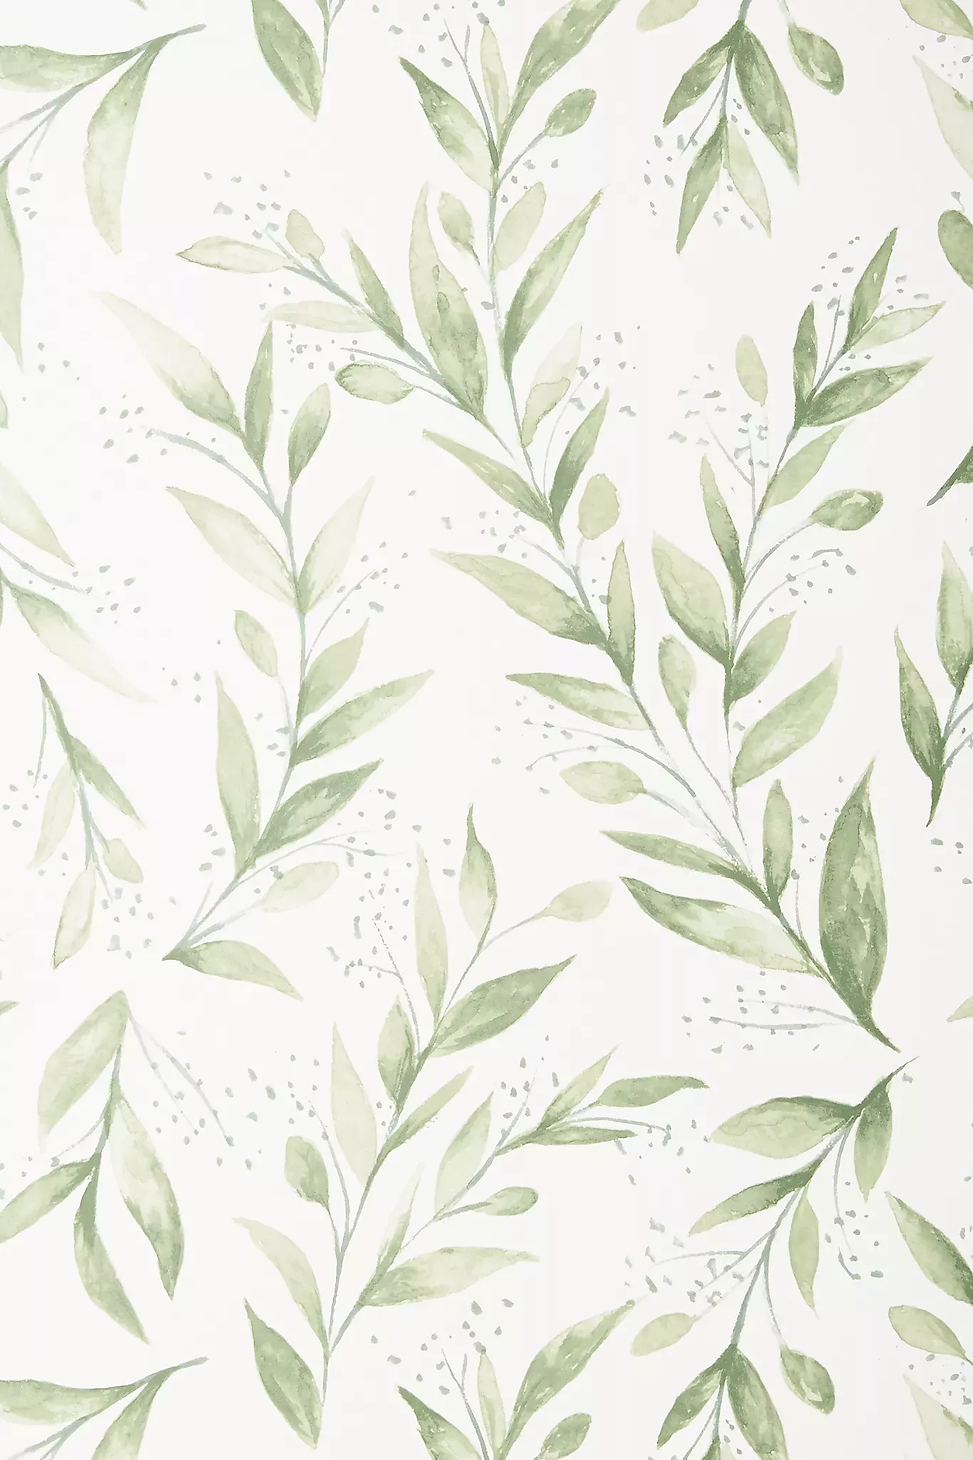 Magnolia Home Olive Branch Wallpaper.web